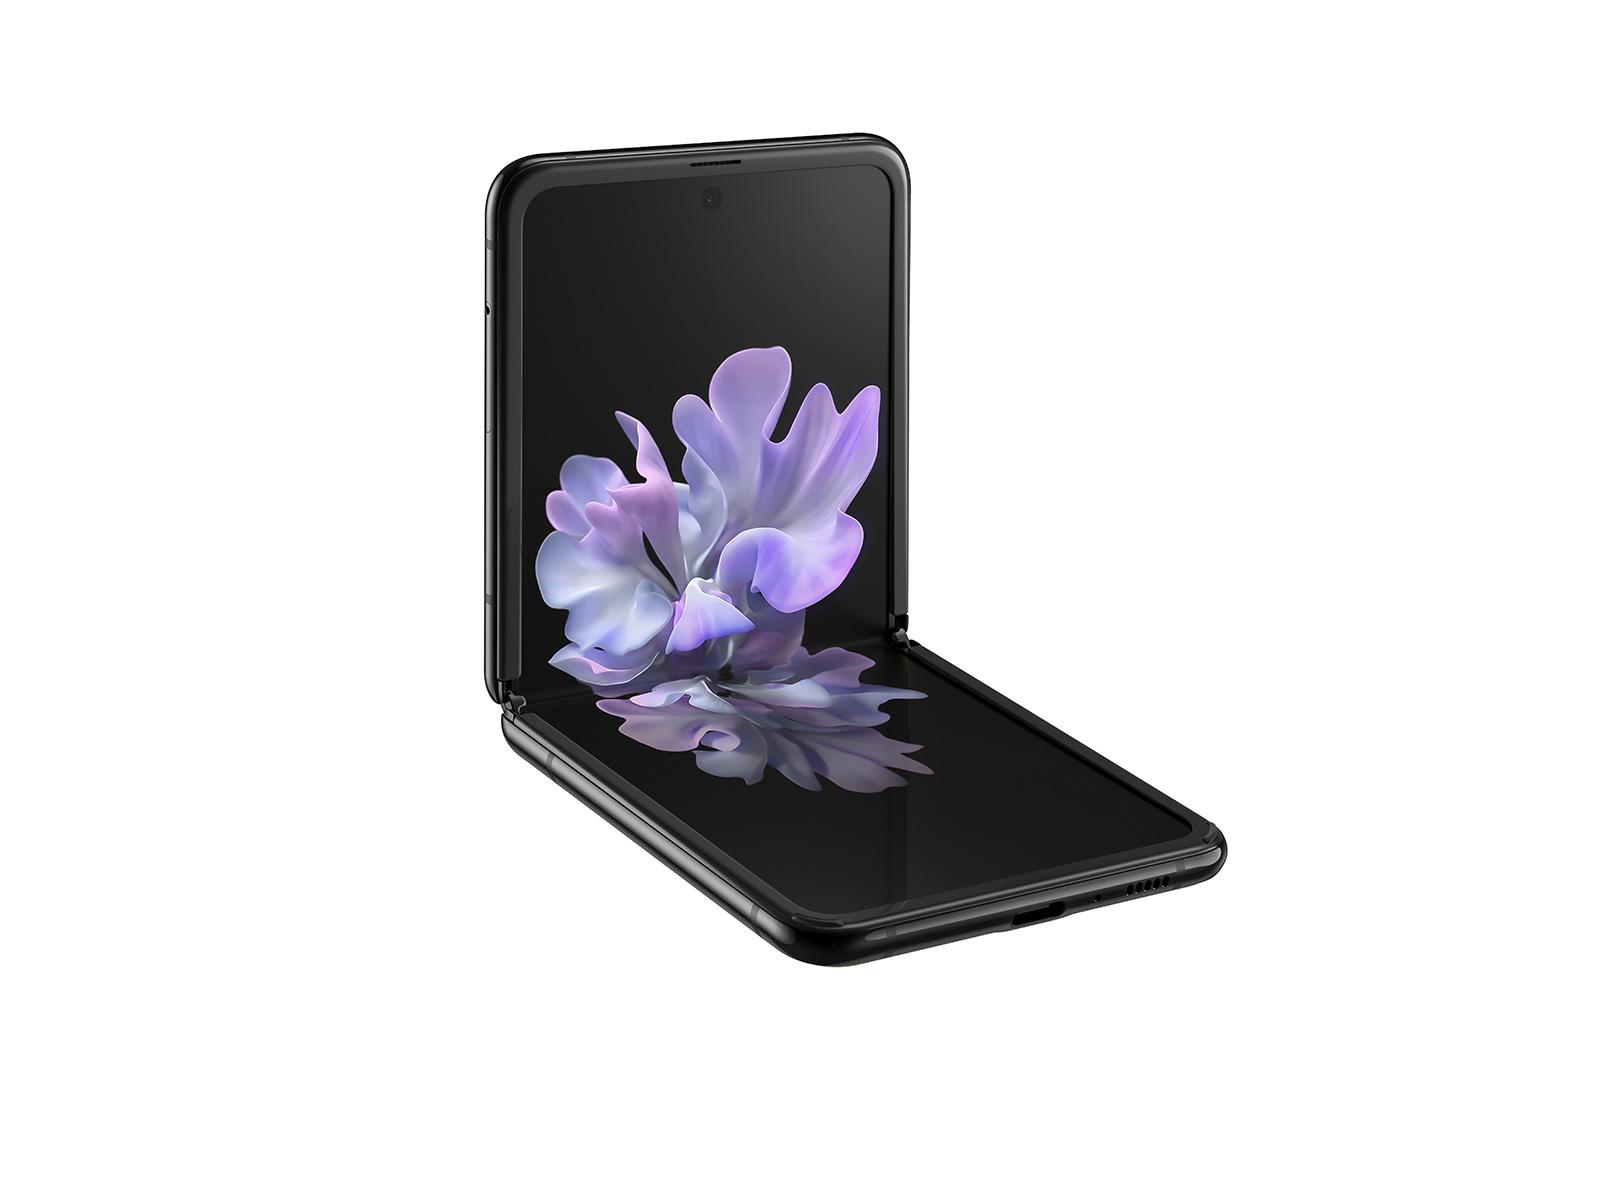 Galaxy Z Flip Z Flip 5g Folding Smartphone Samsung Us